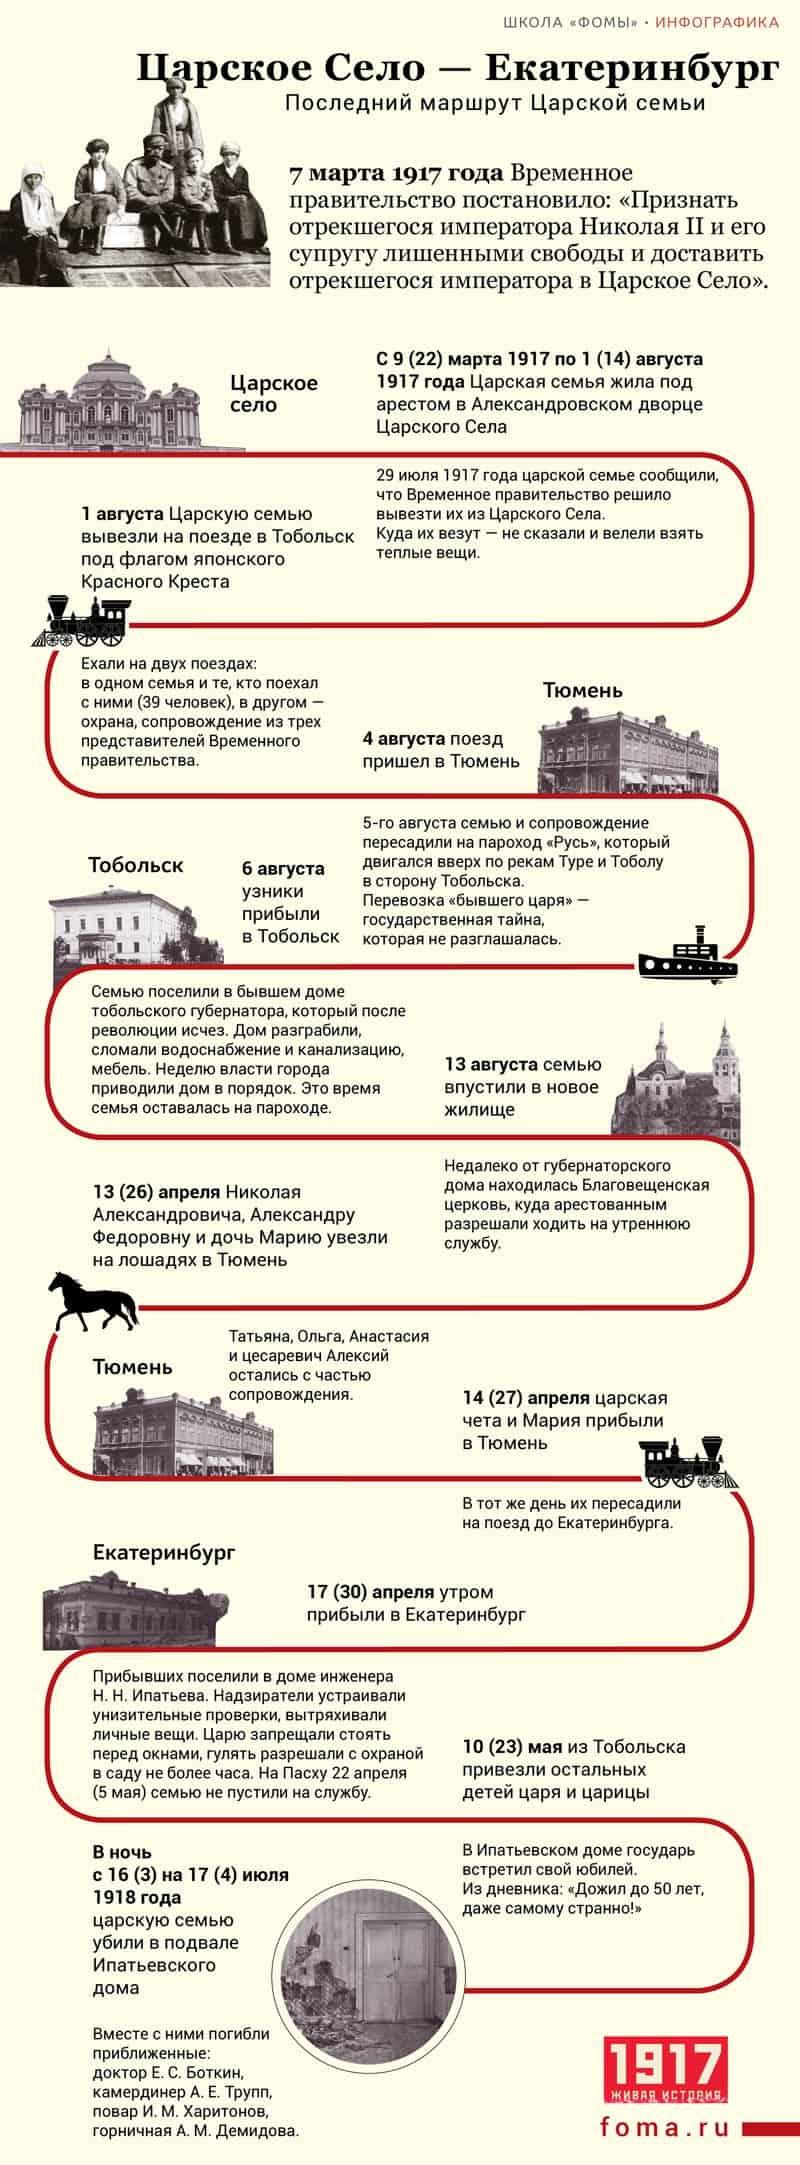 Царское Село - Екатеринбург